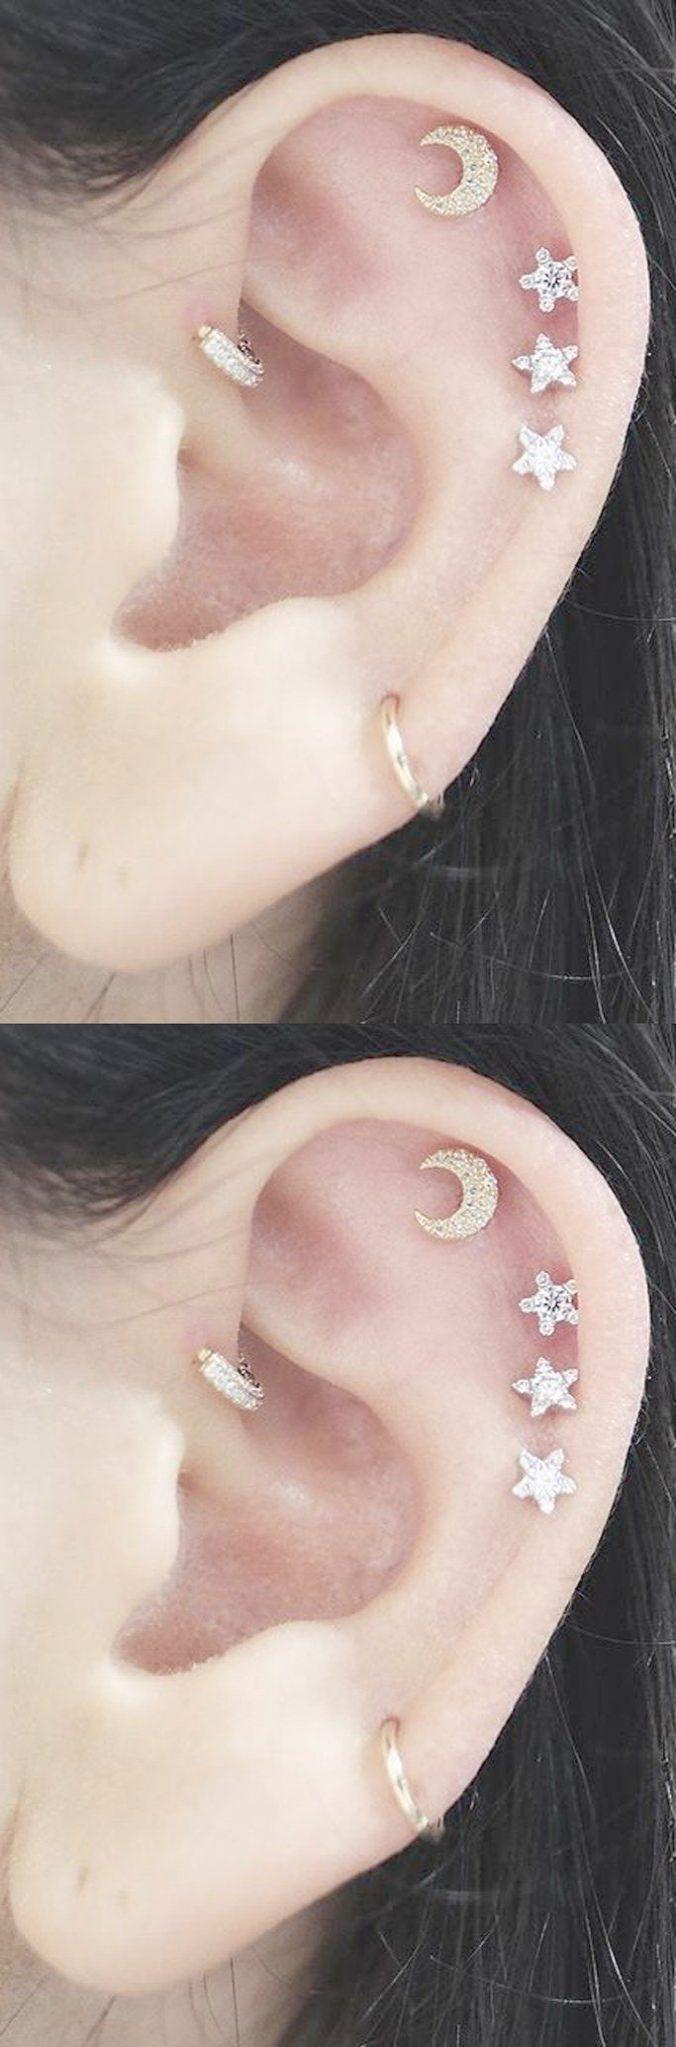 23+ Body piercing jewelry shops near me info